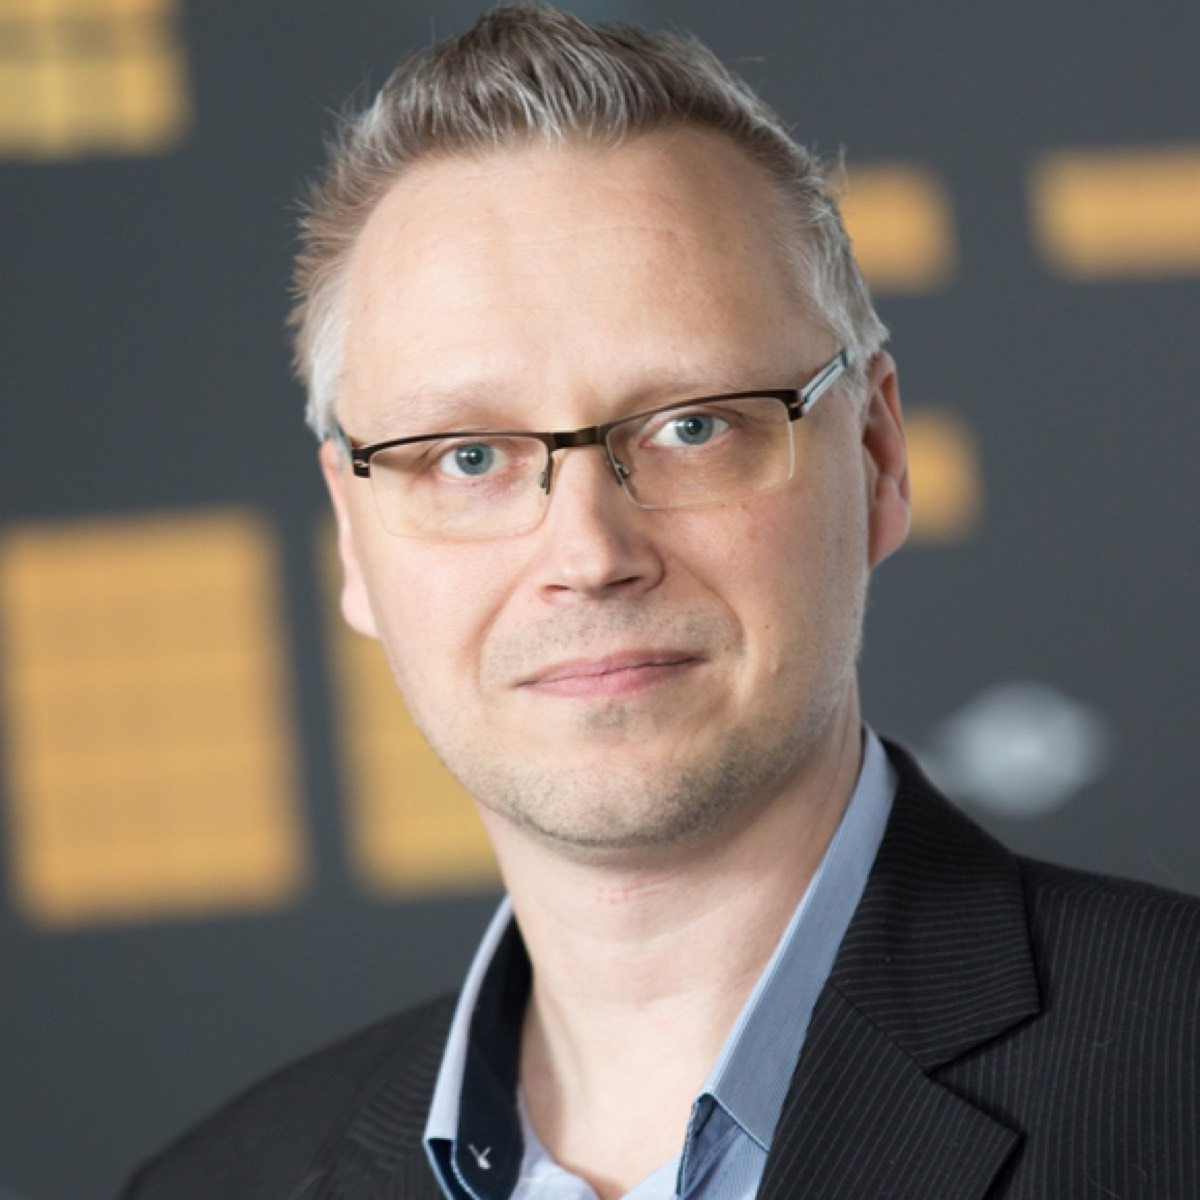 Juha Luomala